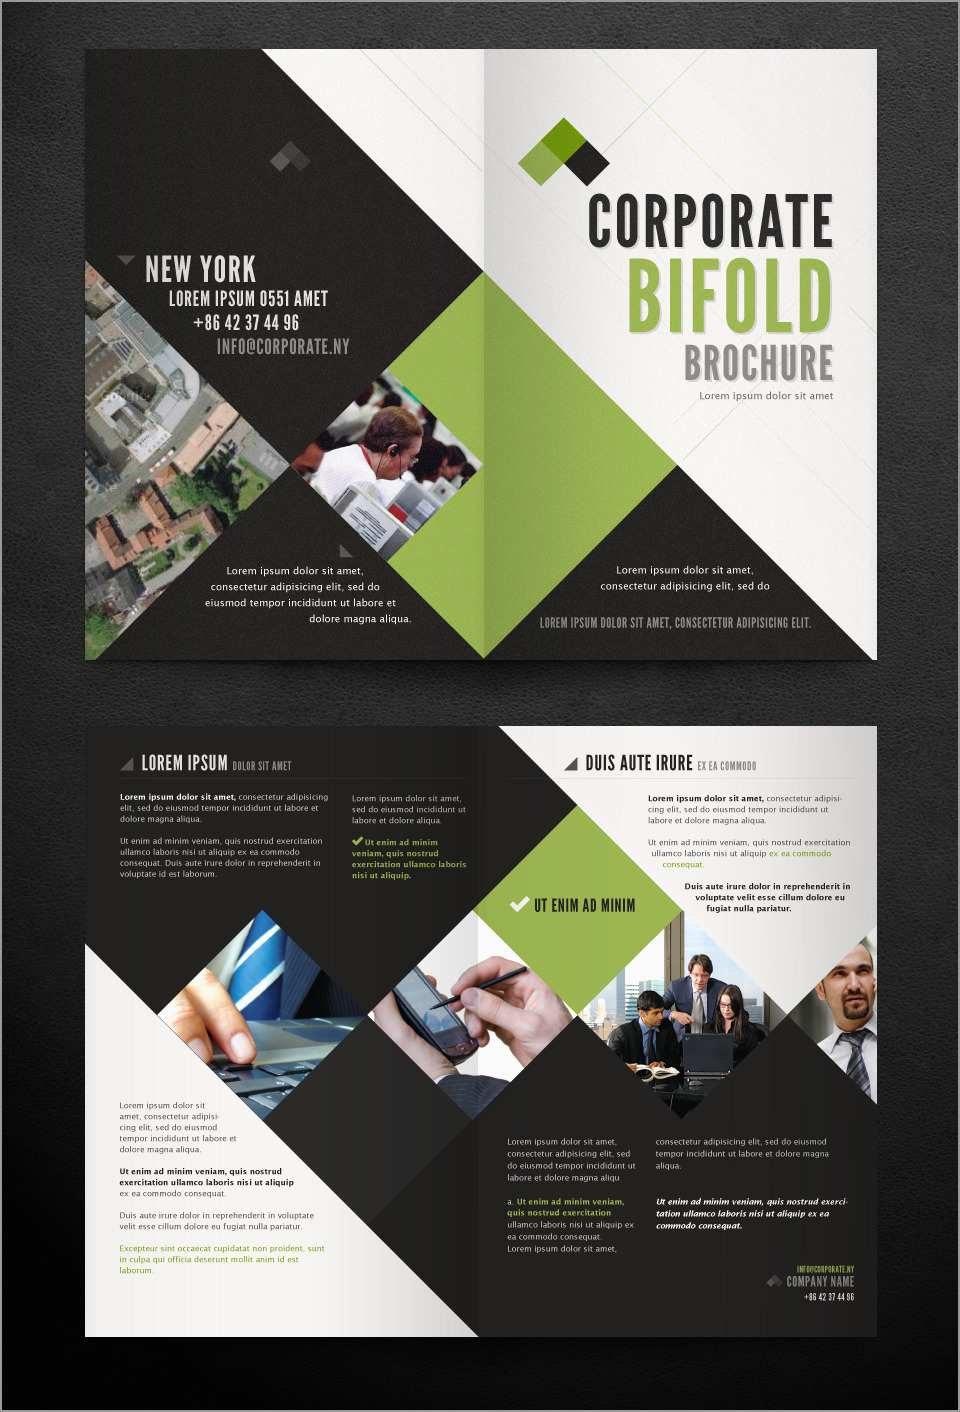 Brochure Design Templates Free Download Wonderfully Adobe Throughout Illustrator Brochure Templates Free Download